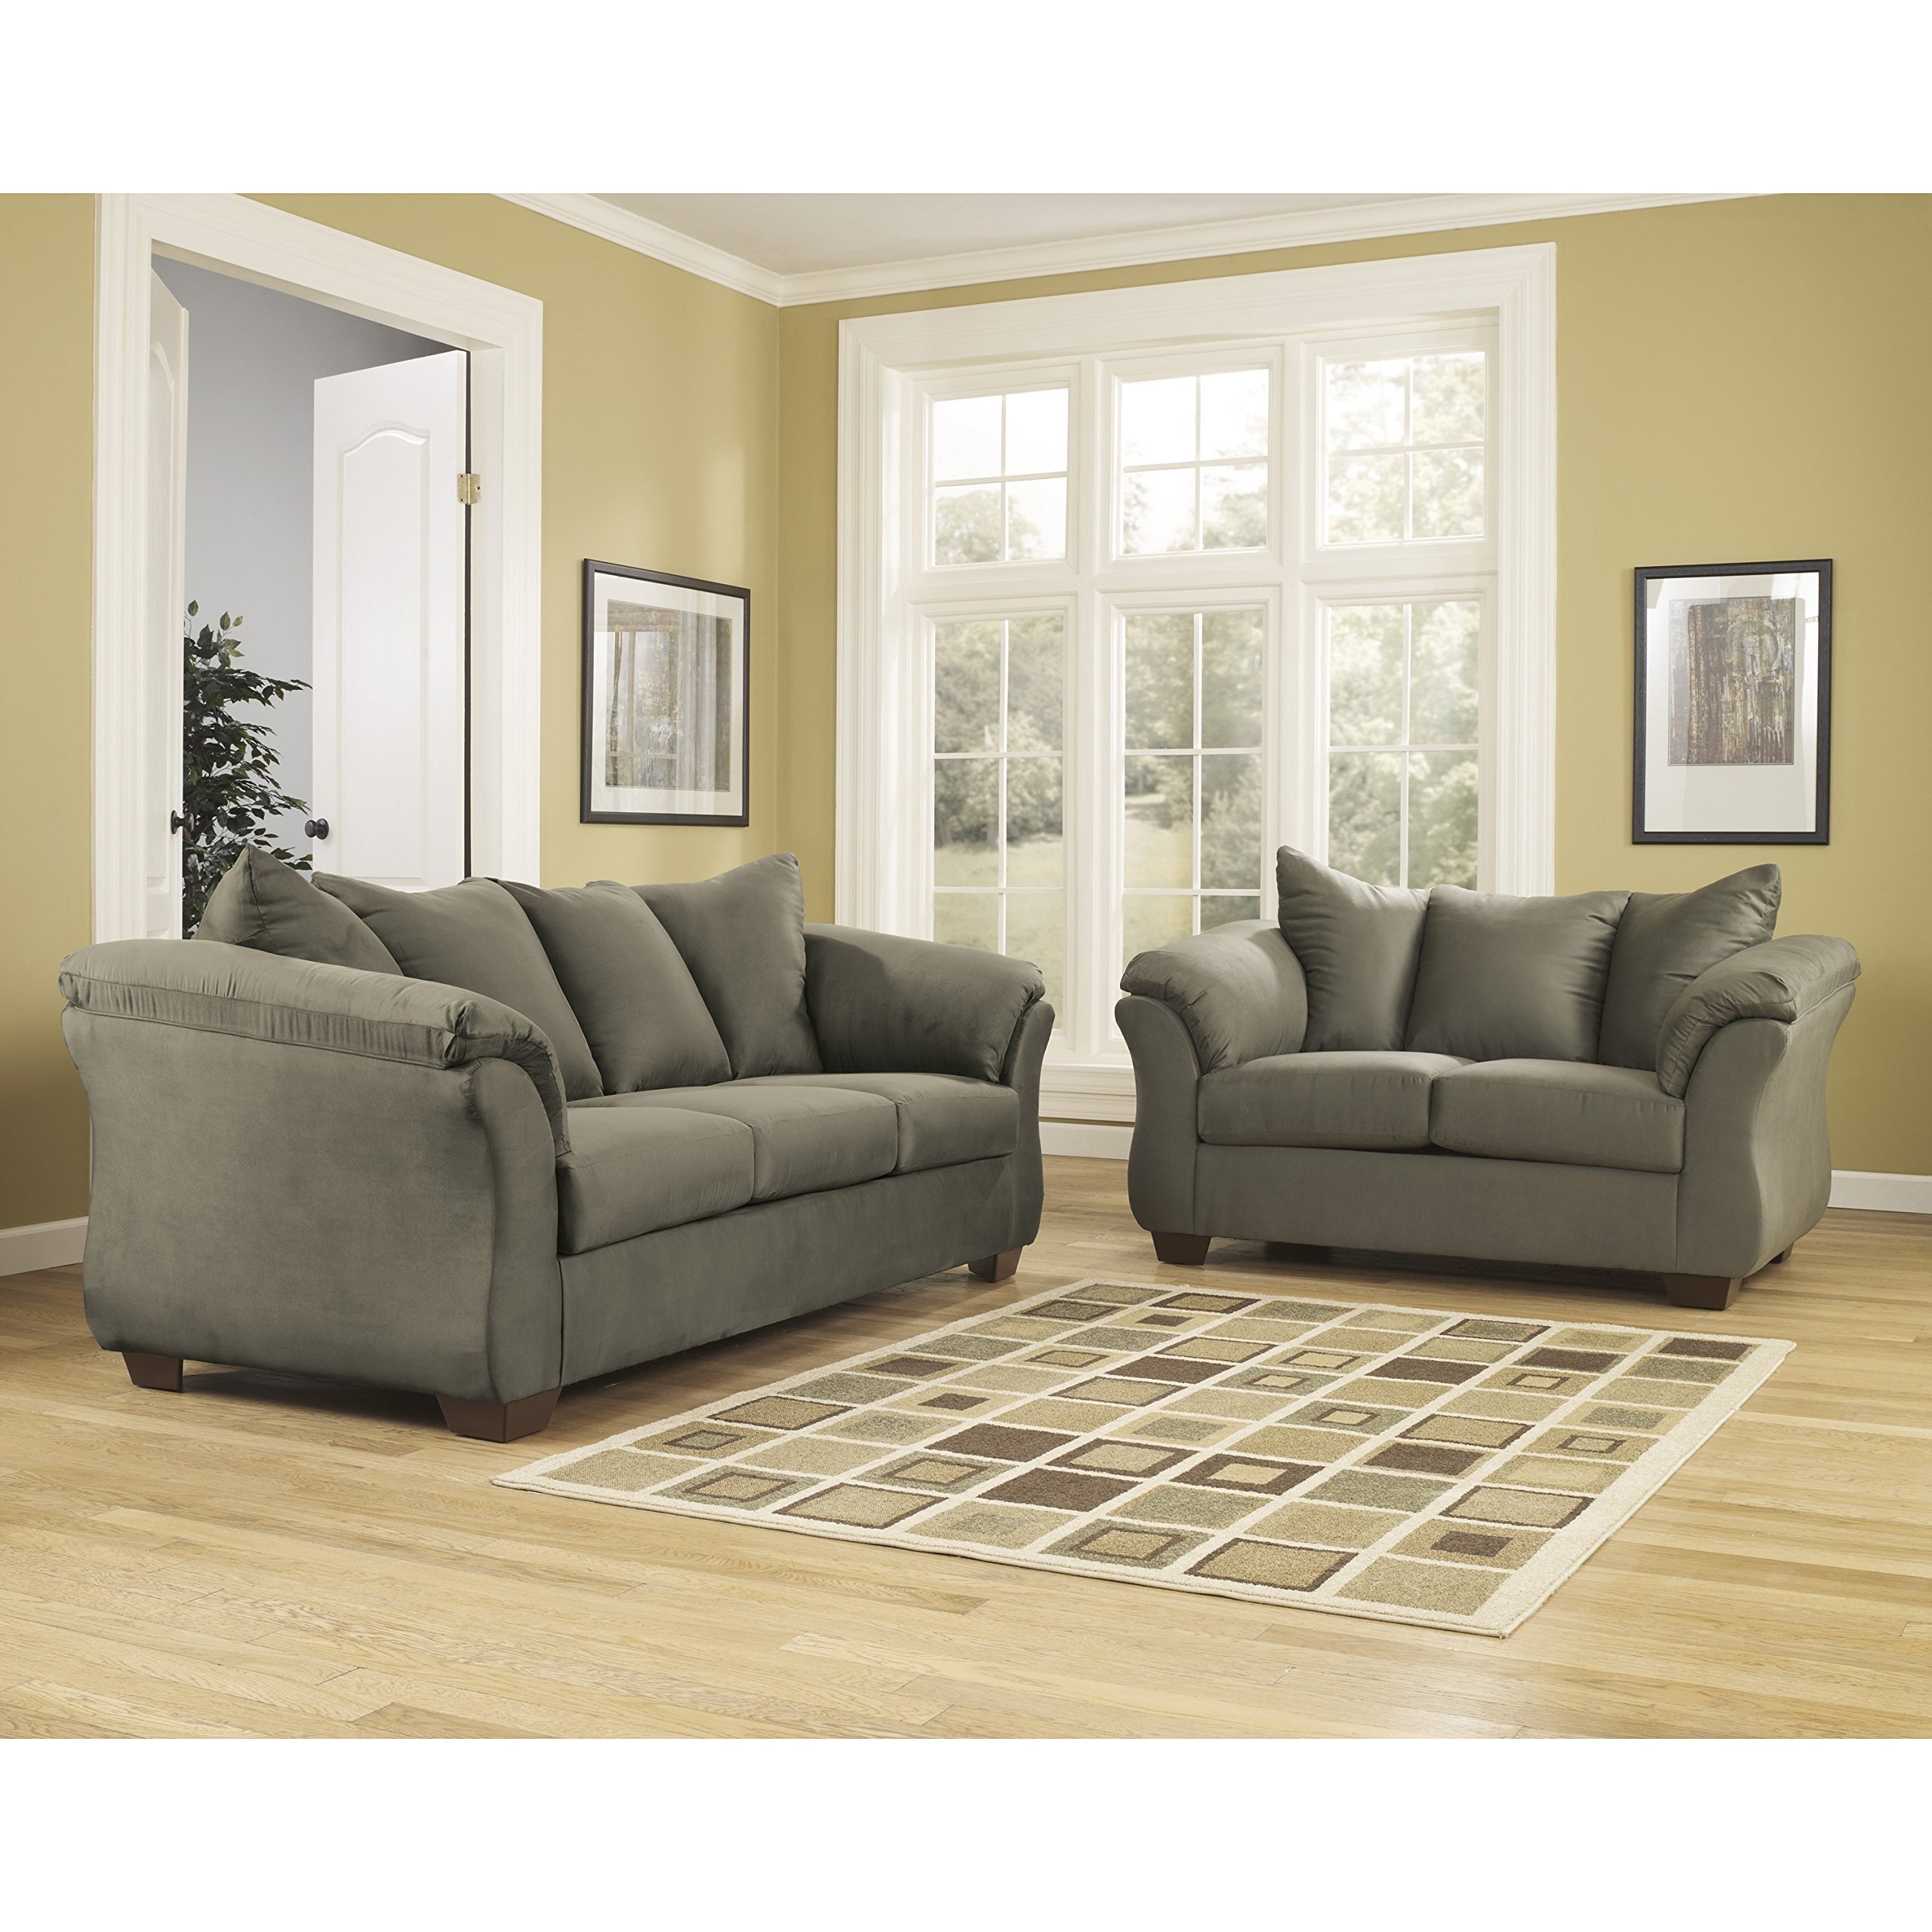 Flash Furniture Signature Design by Ashley Darcy Living Room Set in Sage Microfiber